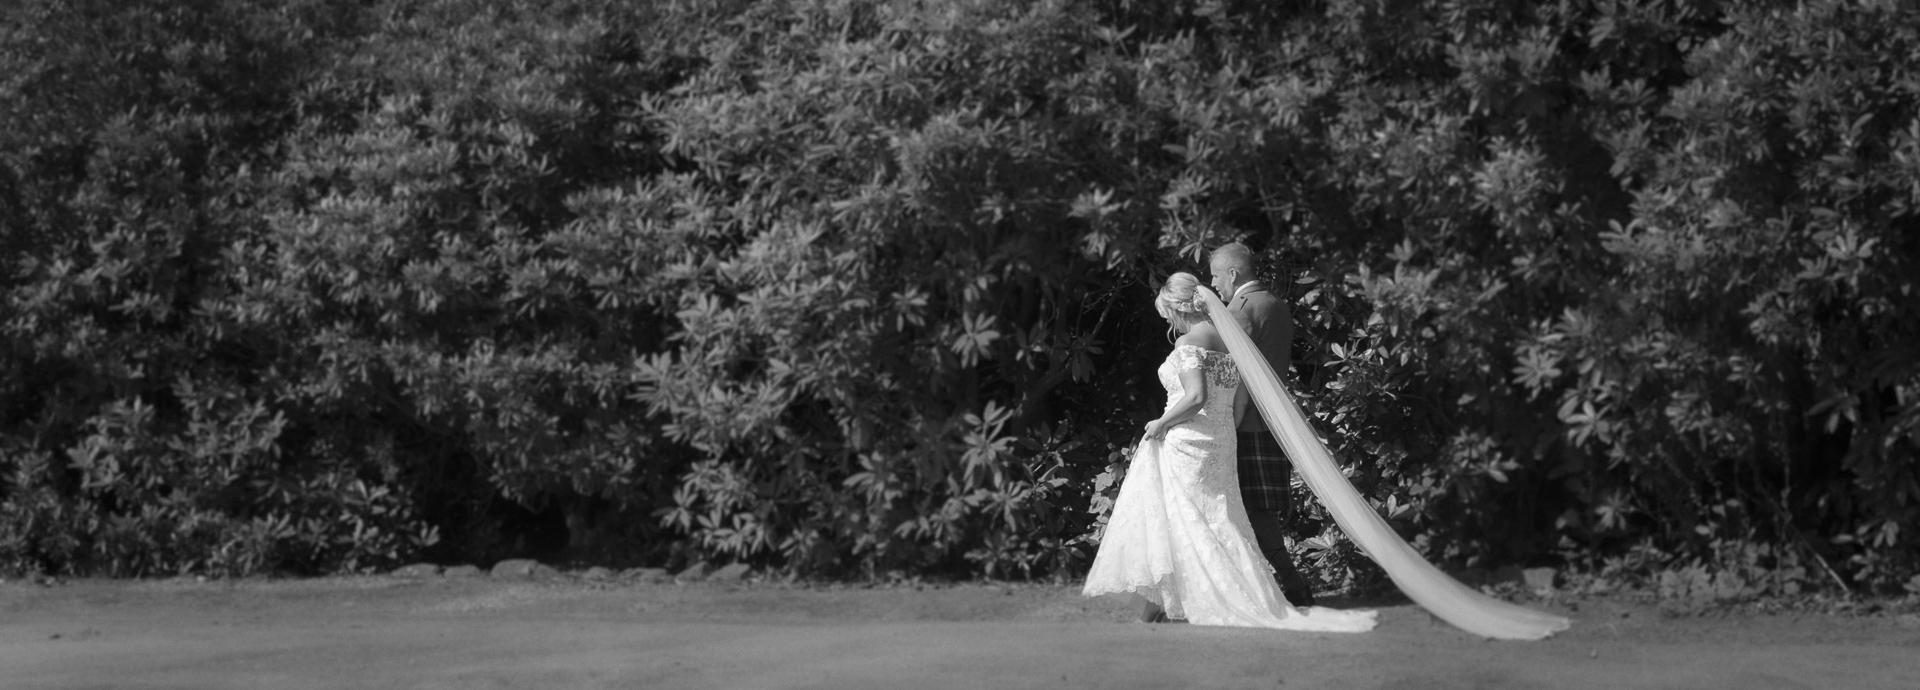 A wedding walk through the woods